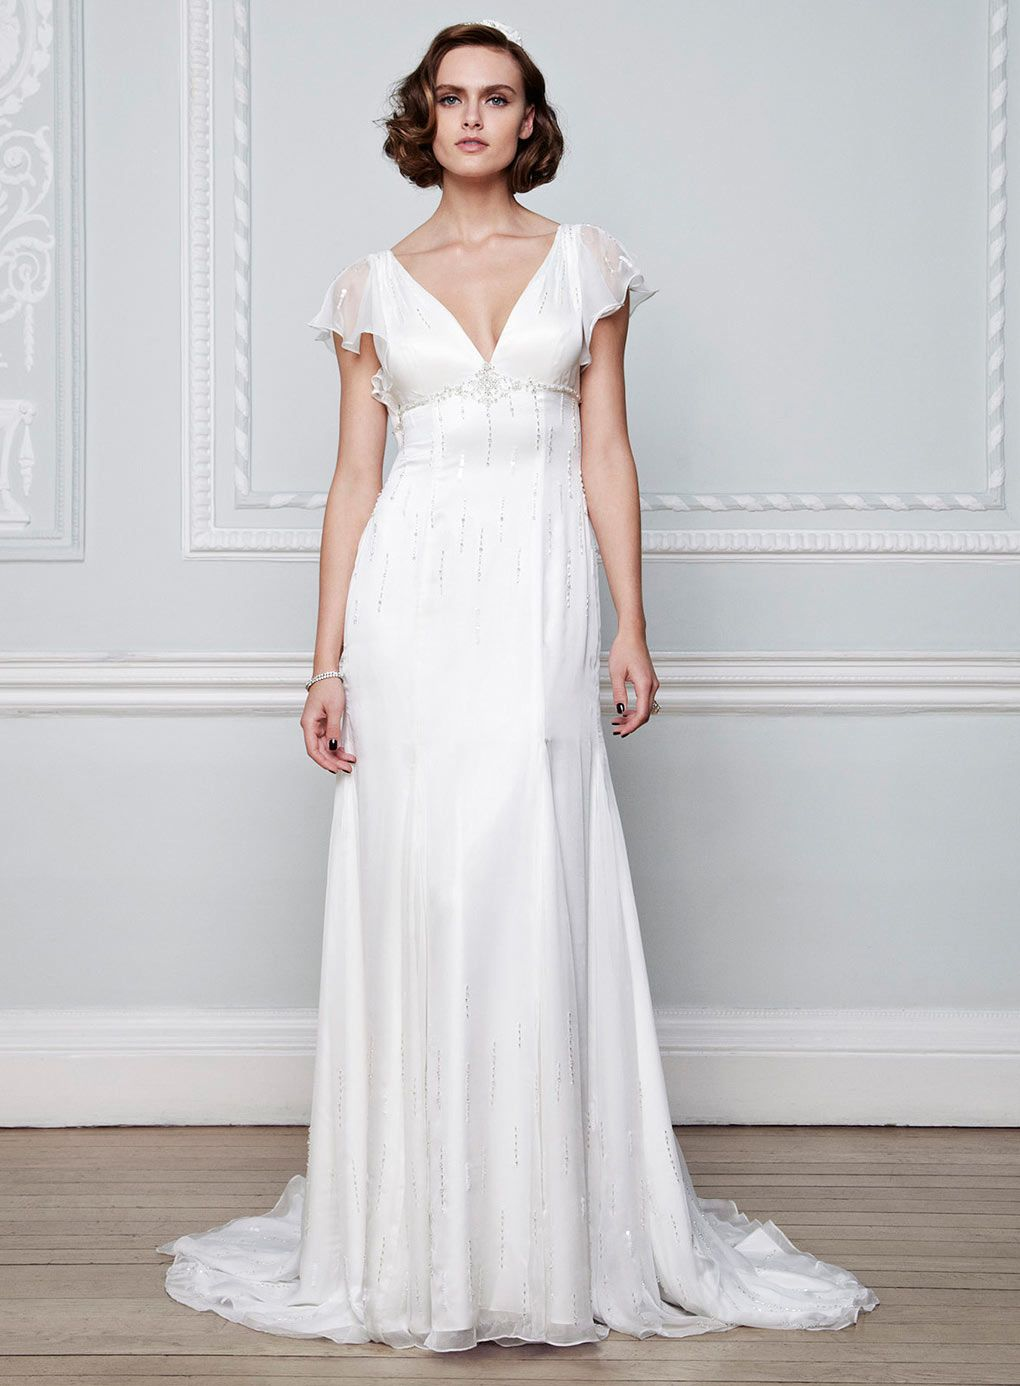 Chiffon wedding dress chiffon wedding dress pinterest bridal lillian vintage chiffon ivory bridal dress wedding dresses the bride wedding bhs ombrellifo Gallery